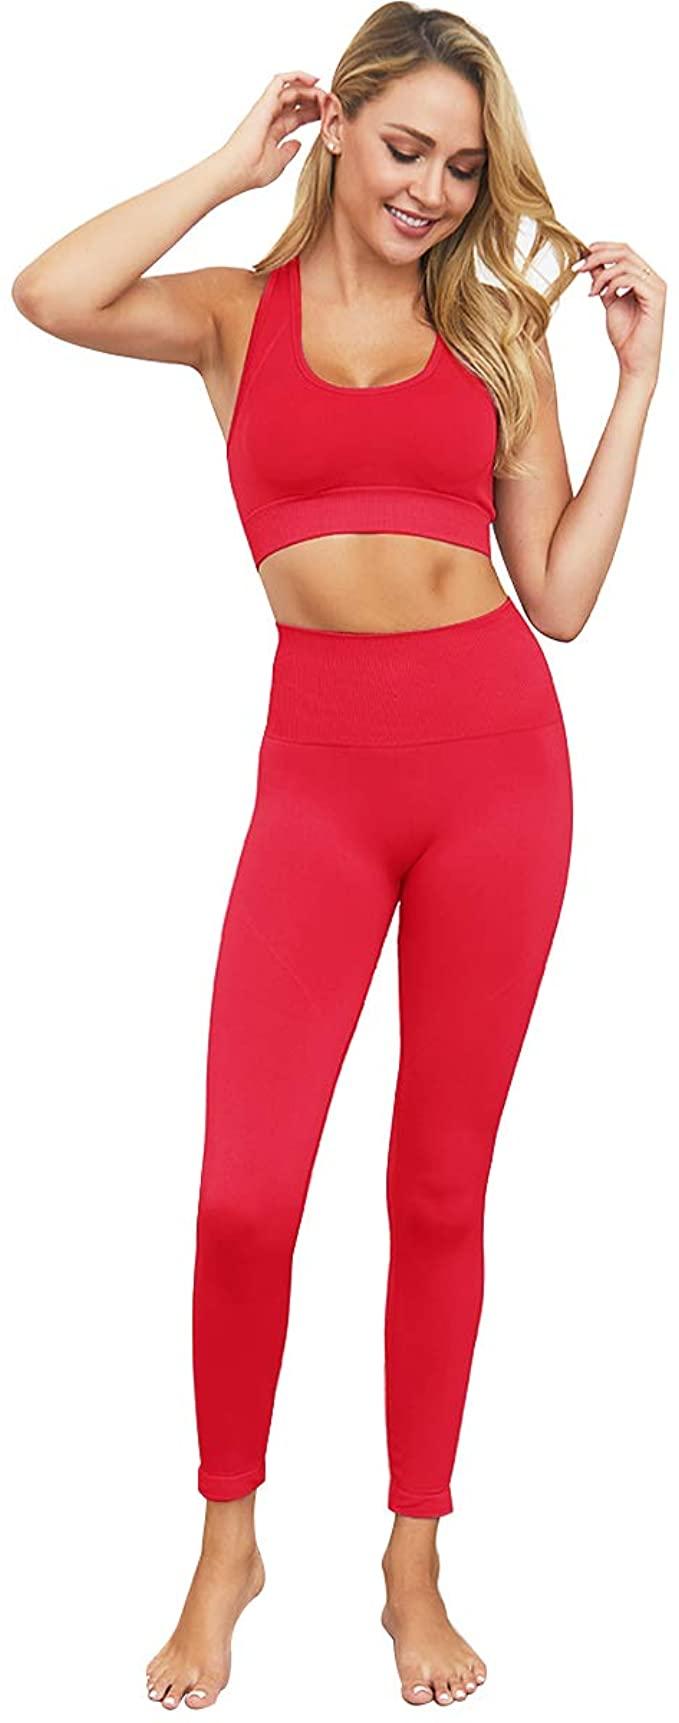 red matching set amazon